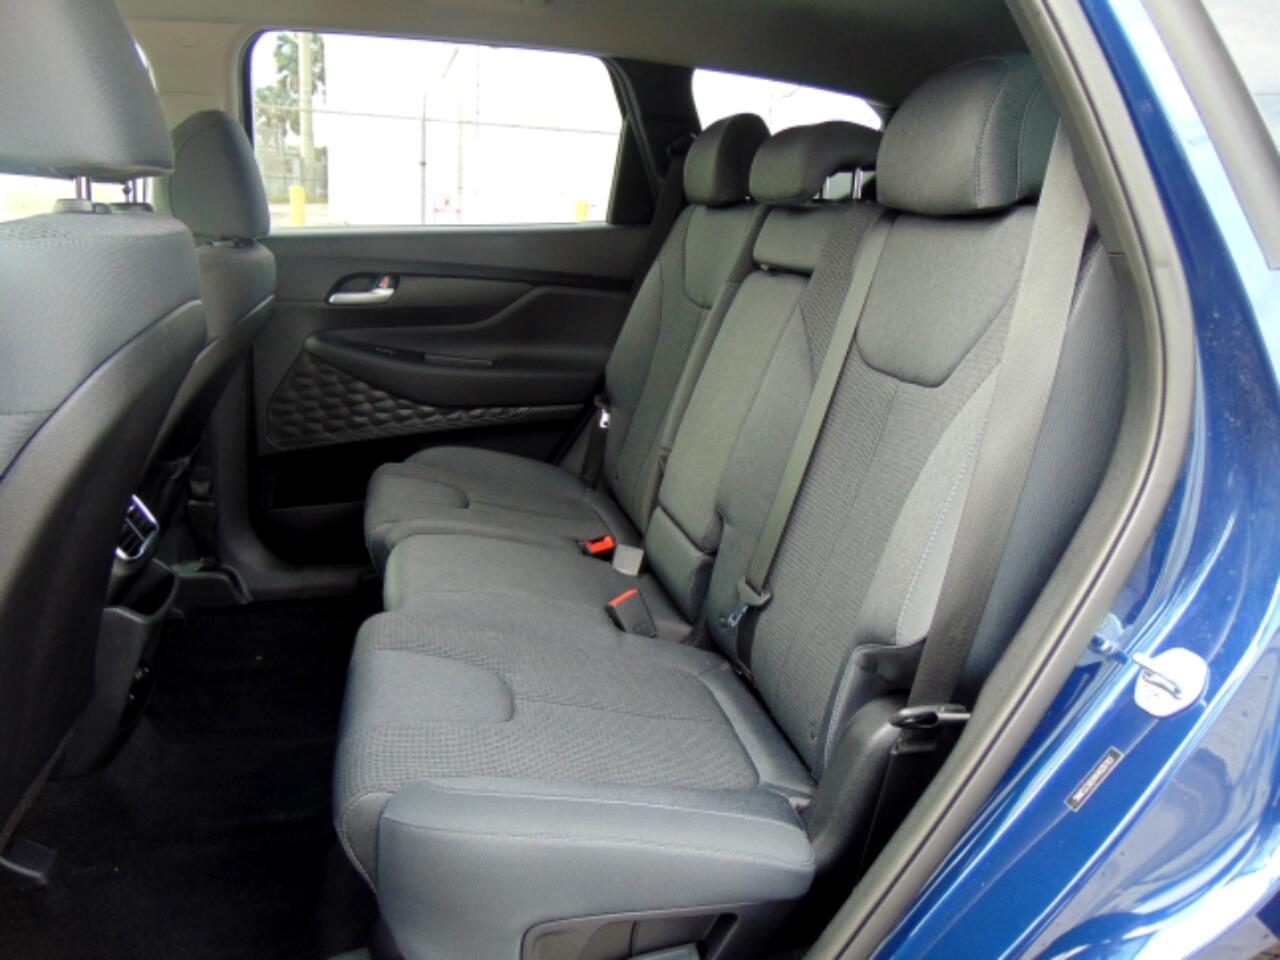 2019 Hyundai Santa Fe SE 2.4L Auto FWD